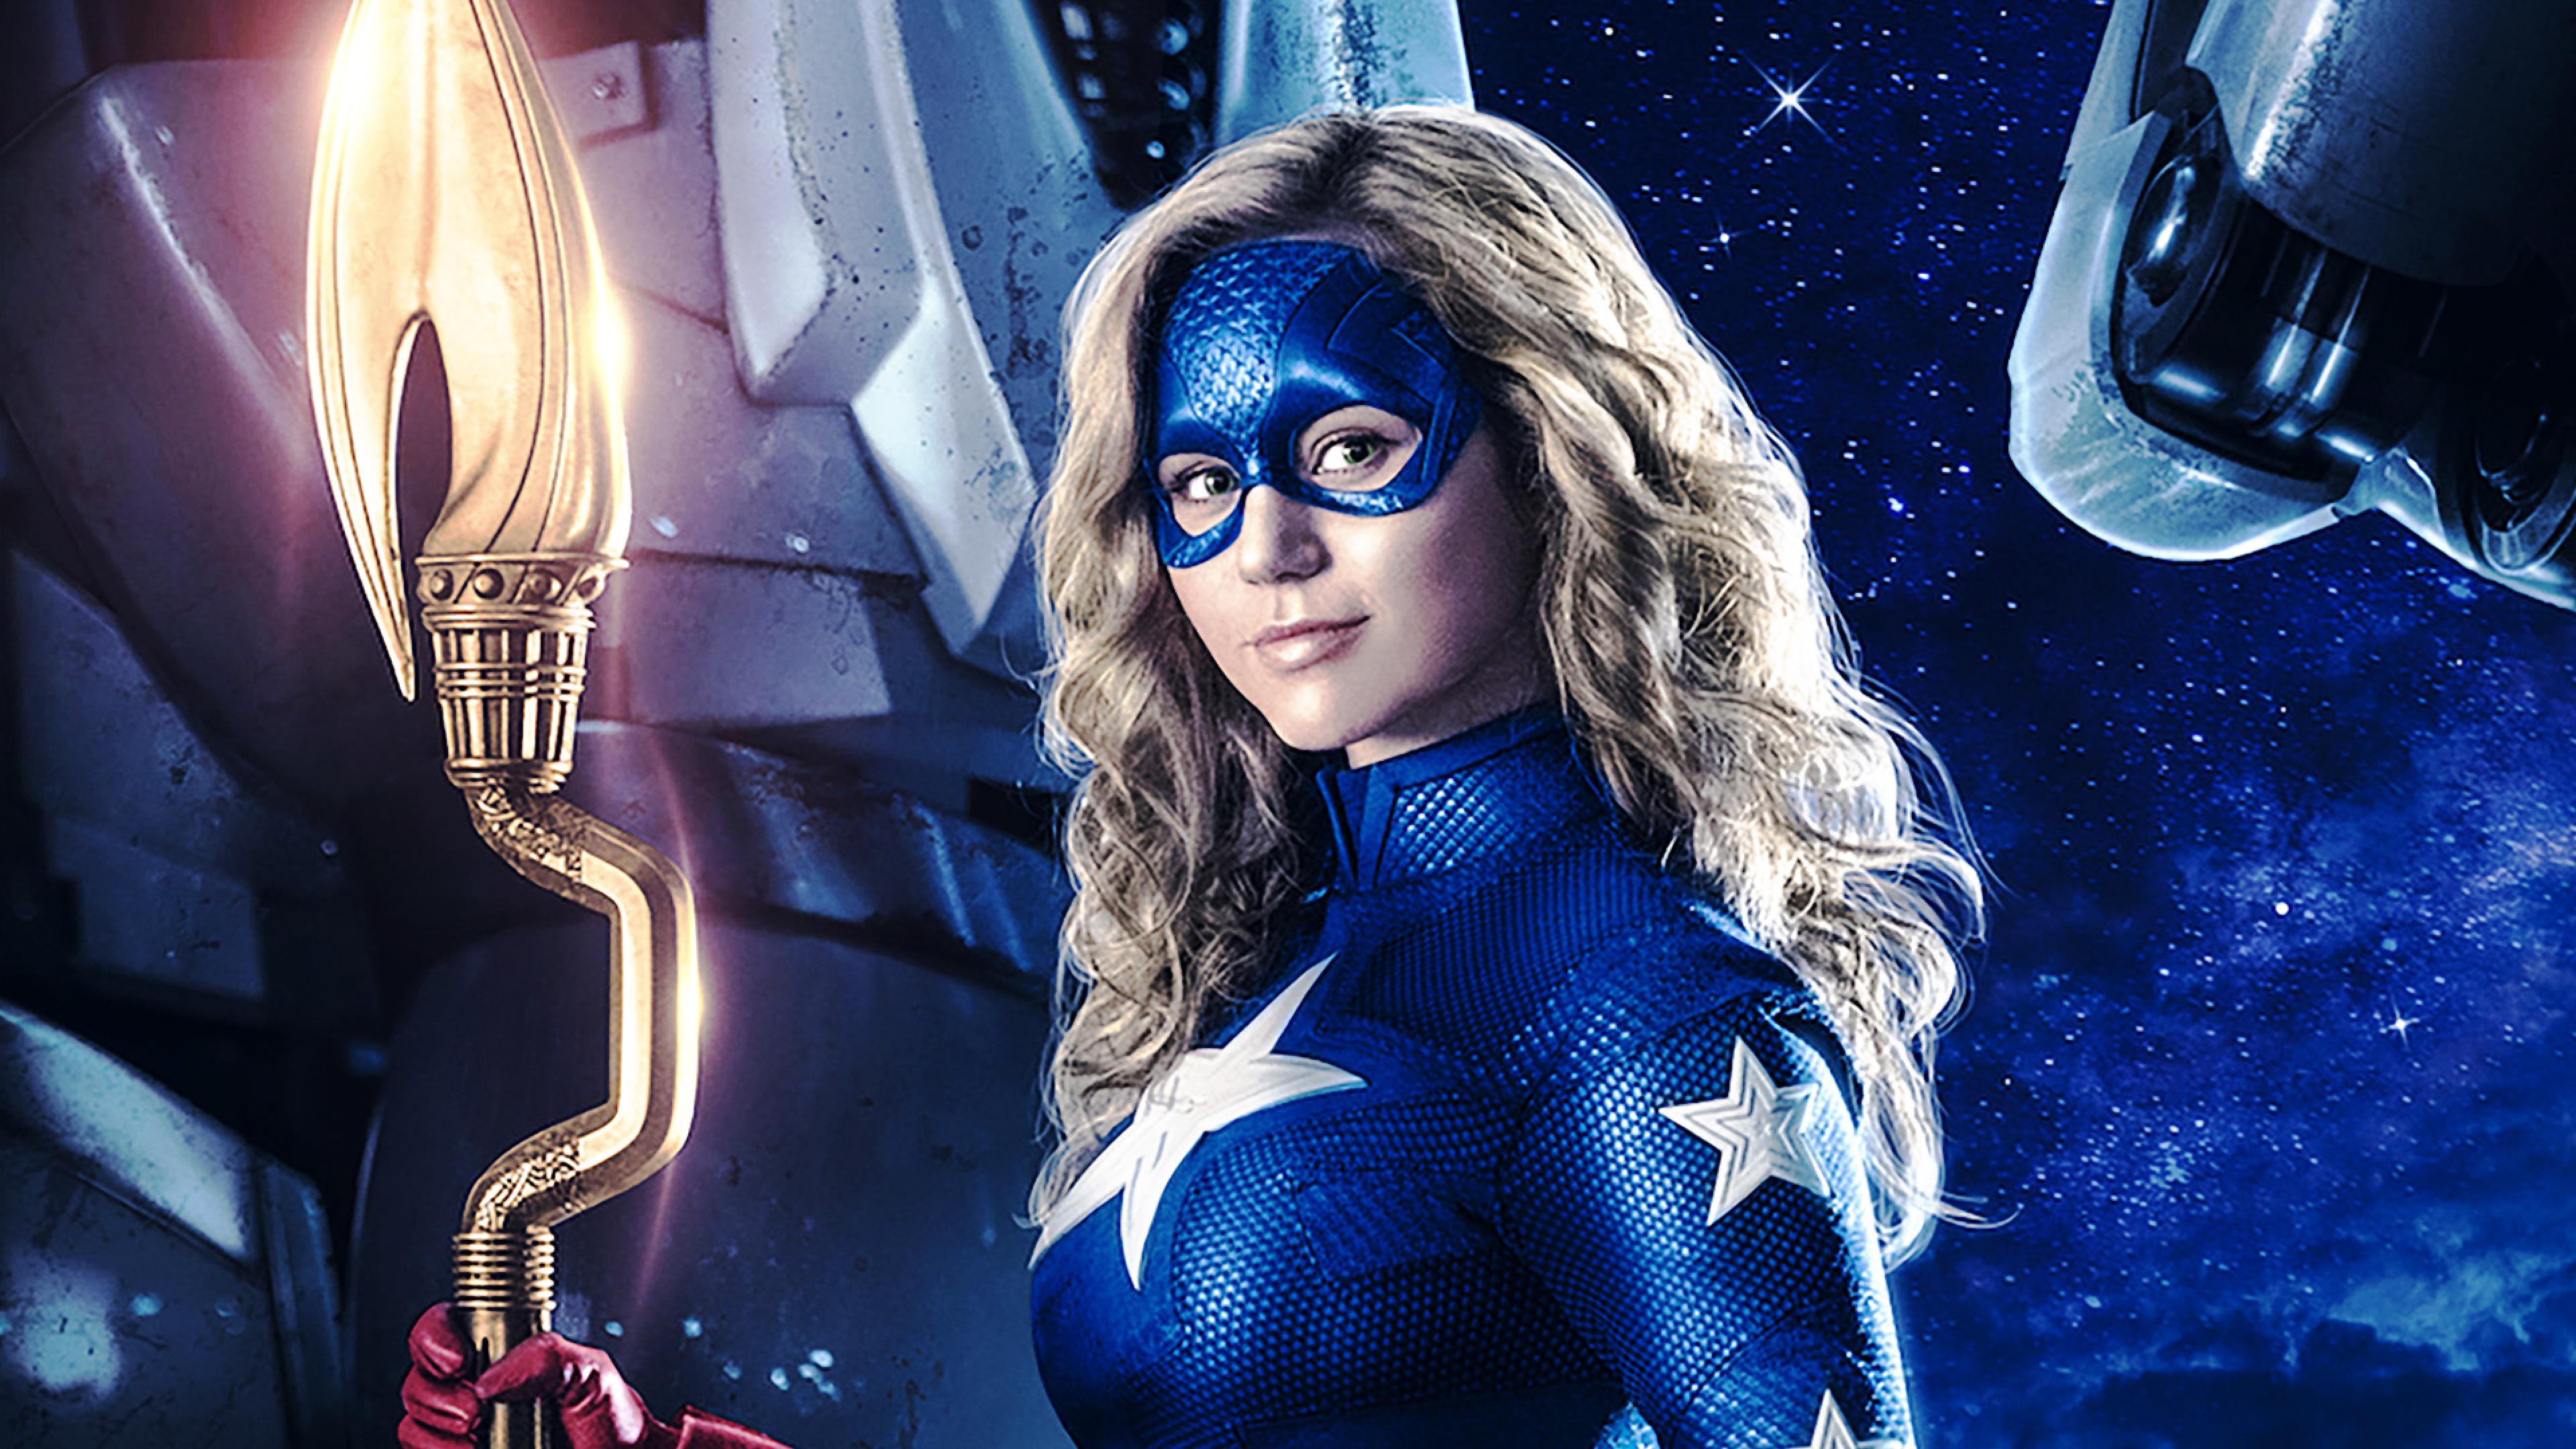 3840x2160 Stargirl DC Universe 4K Wallpaper HD TV Series 4K 3840x2160